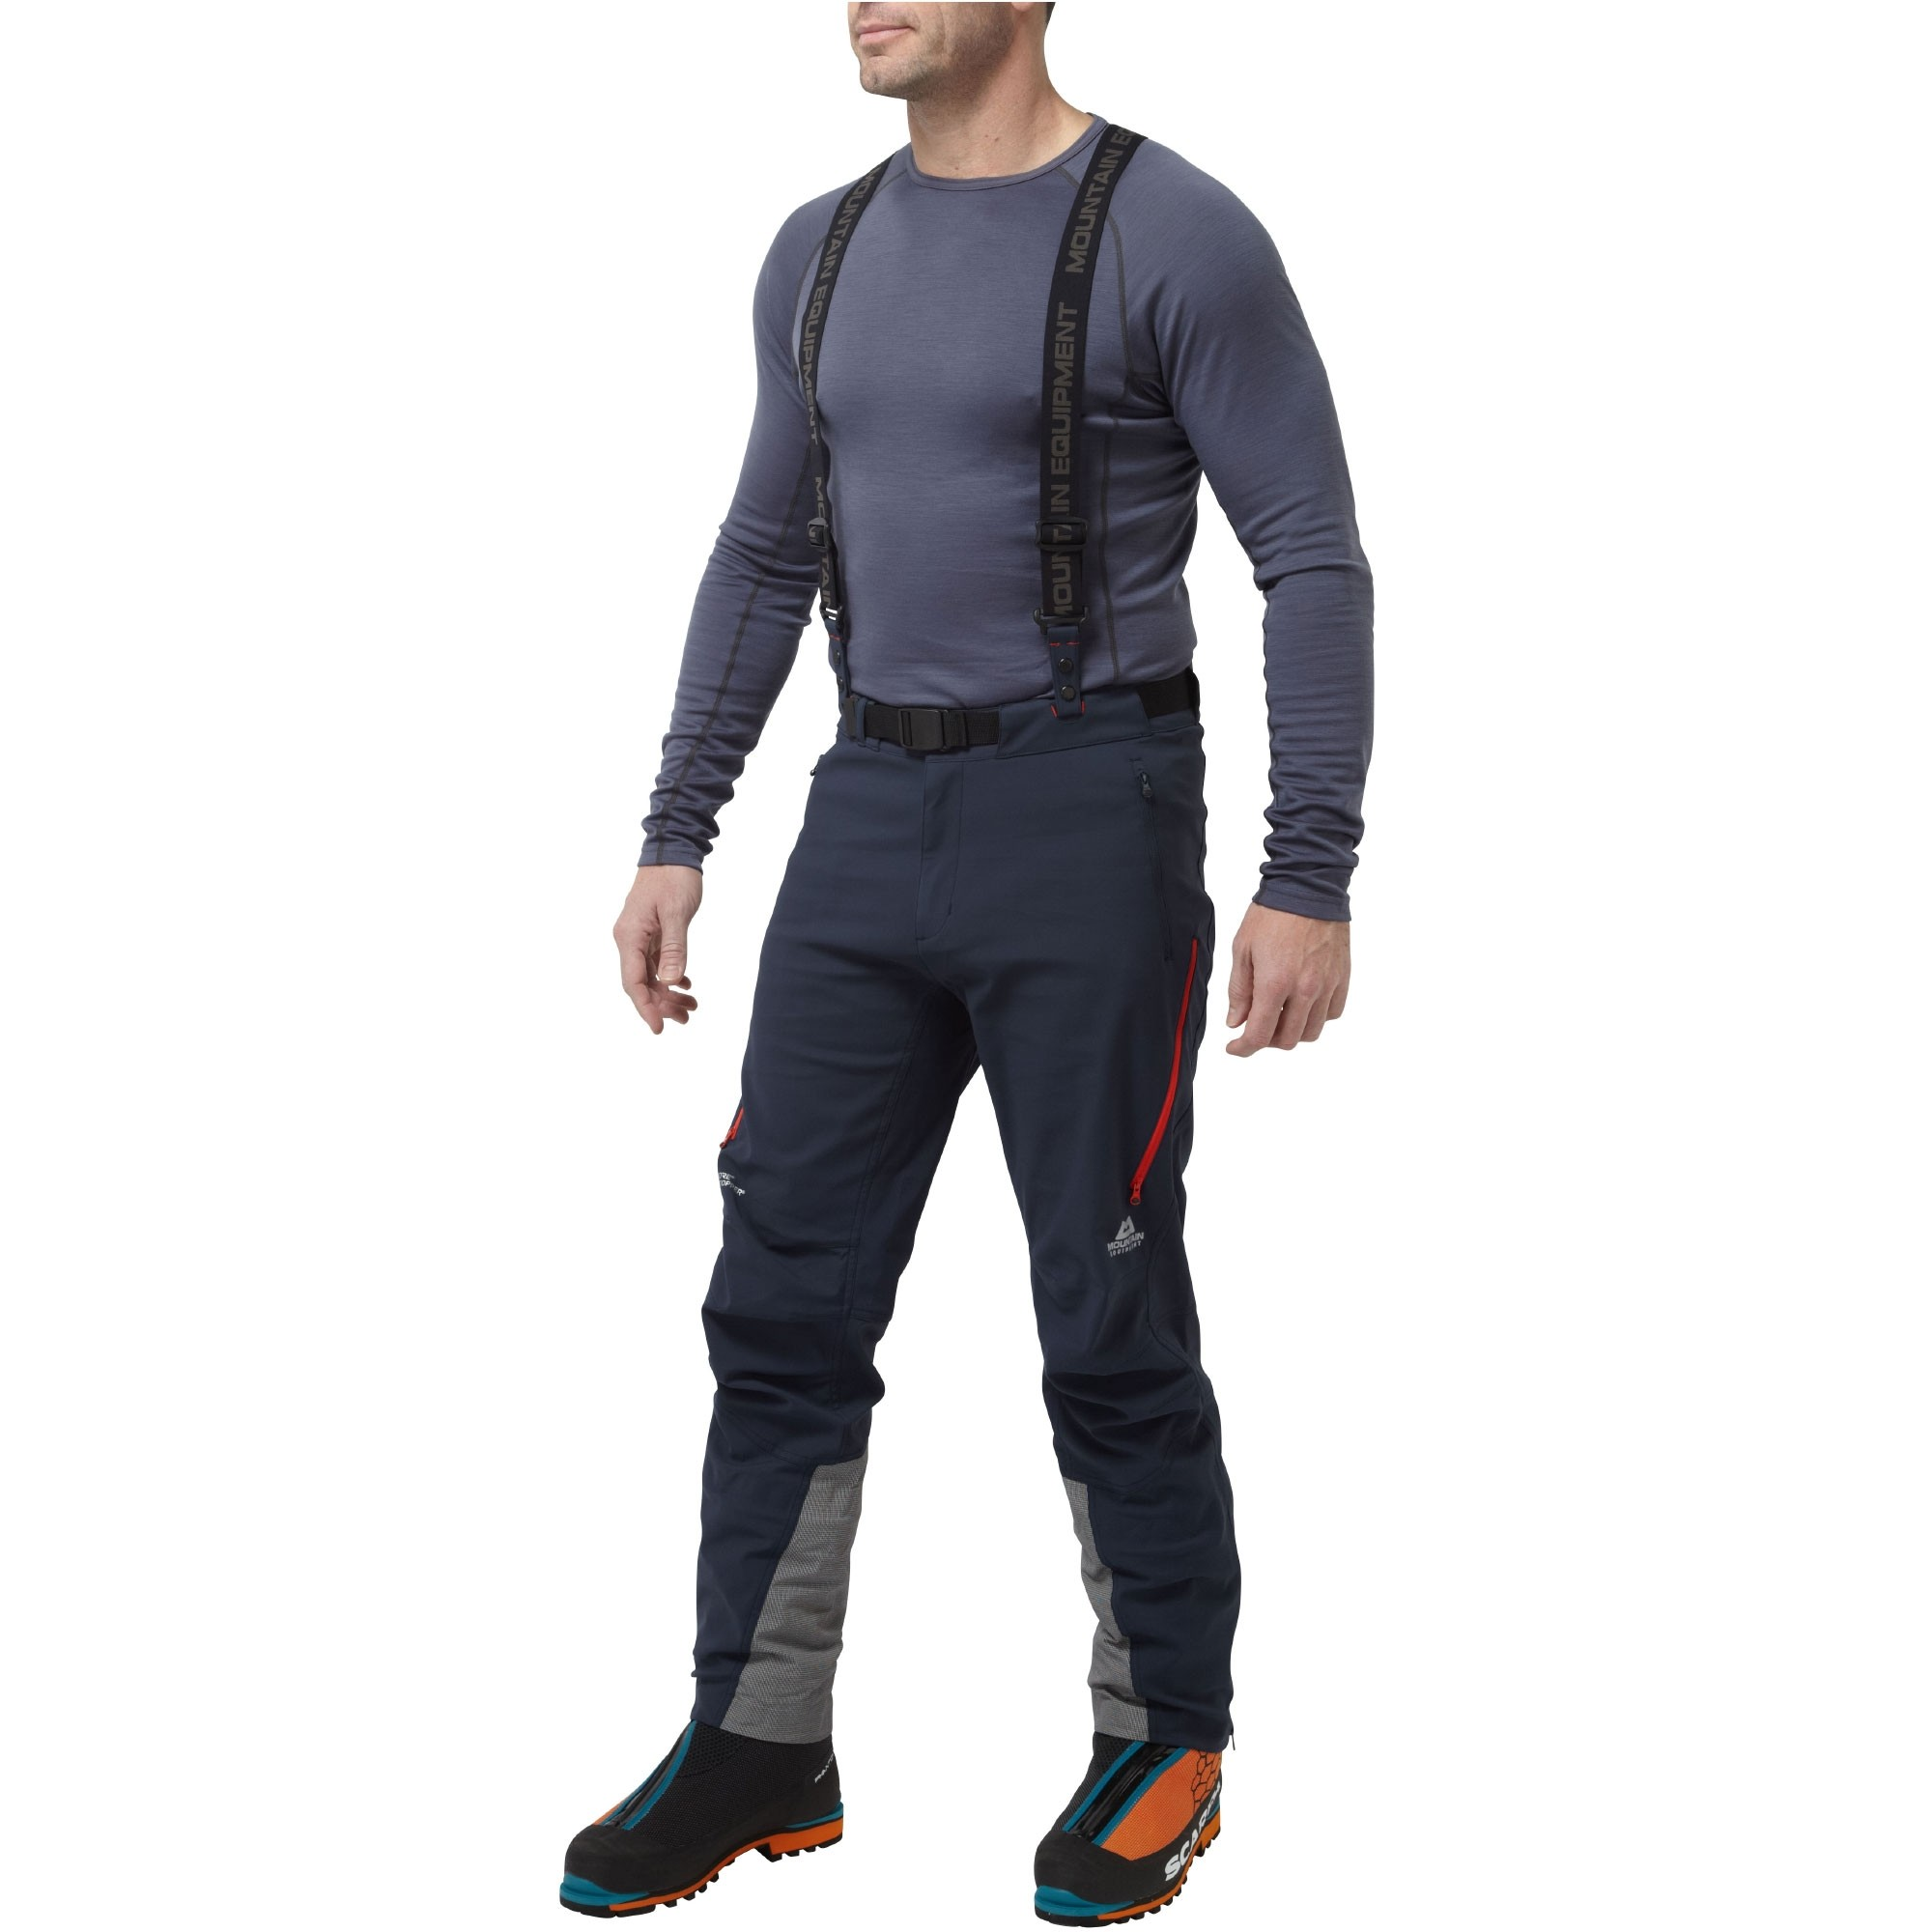 Mountain Equipment G2 Men's Mountain Pant - Cosmos - front